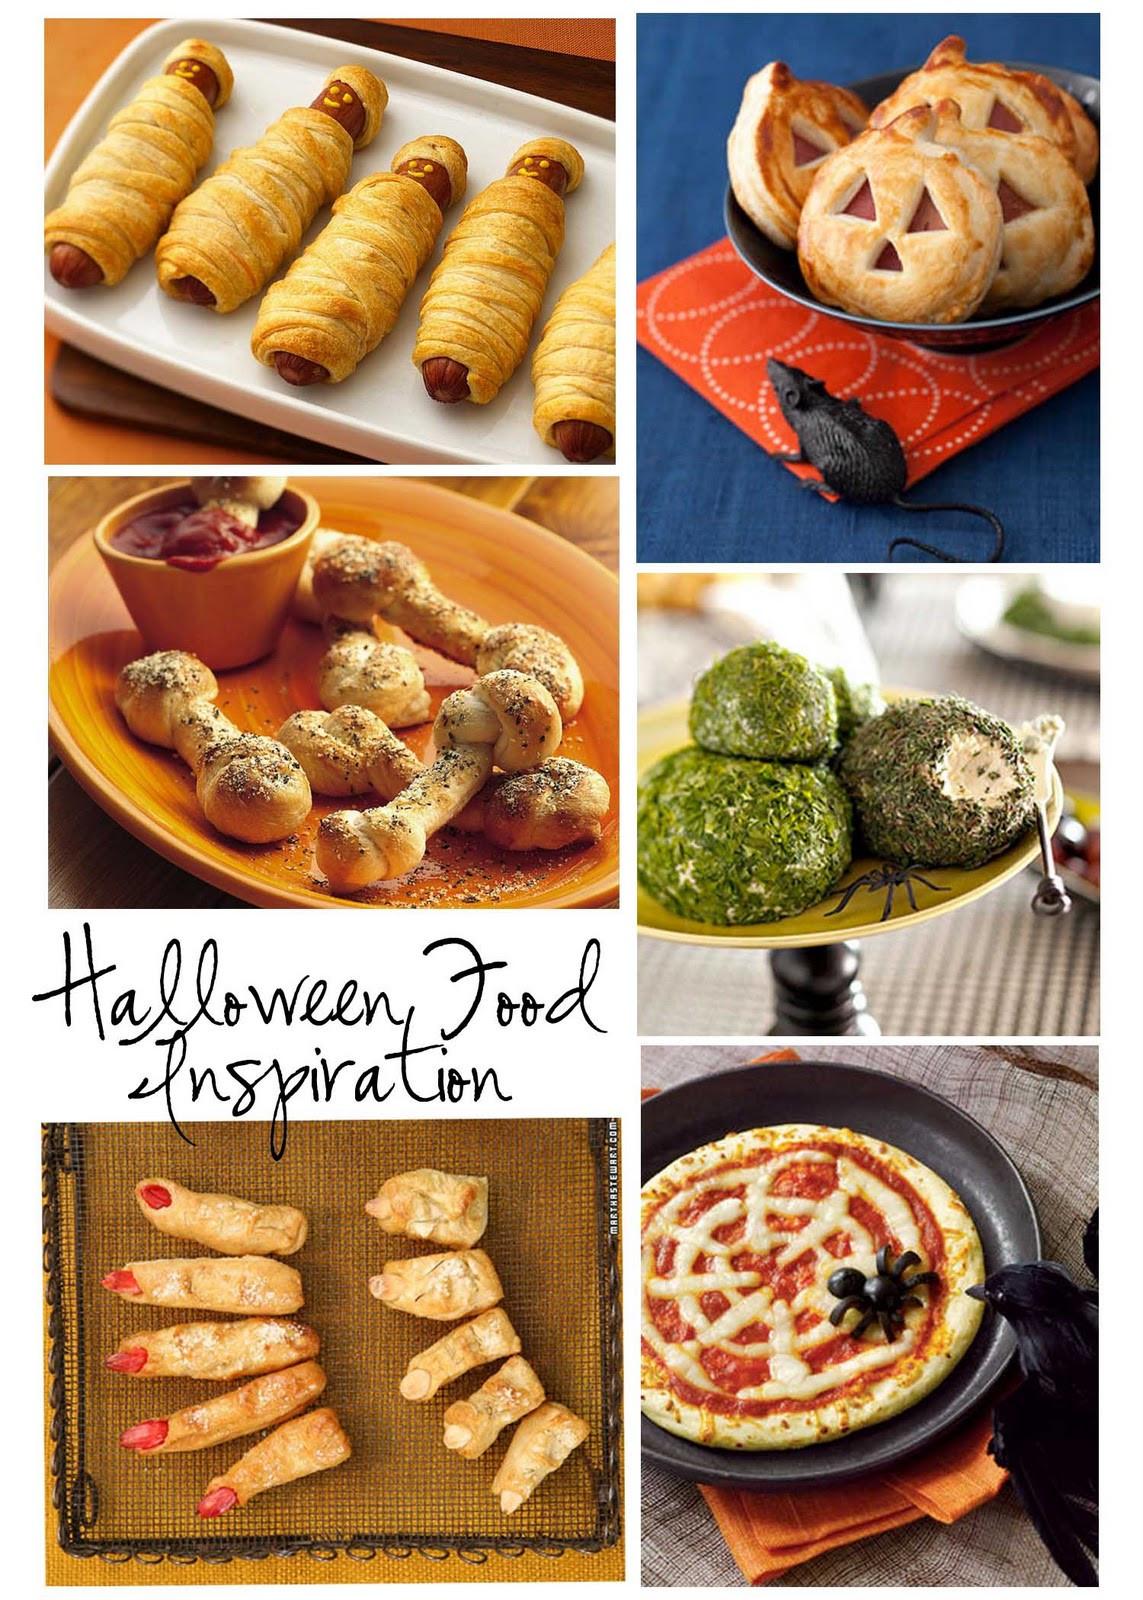 Halloween Party Menu Ideas  Room to Inspire Spooky Food Ideas